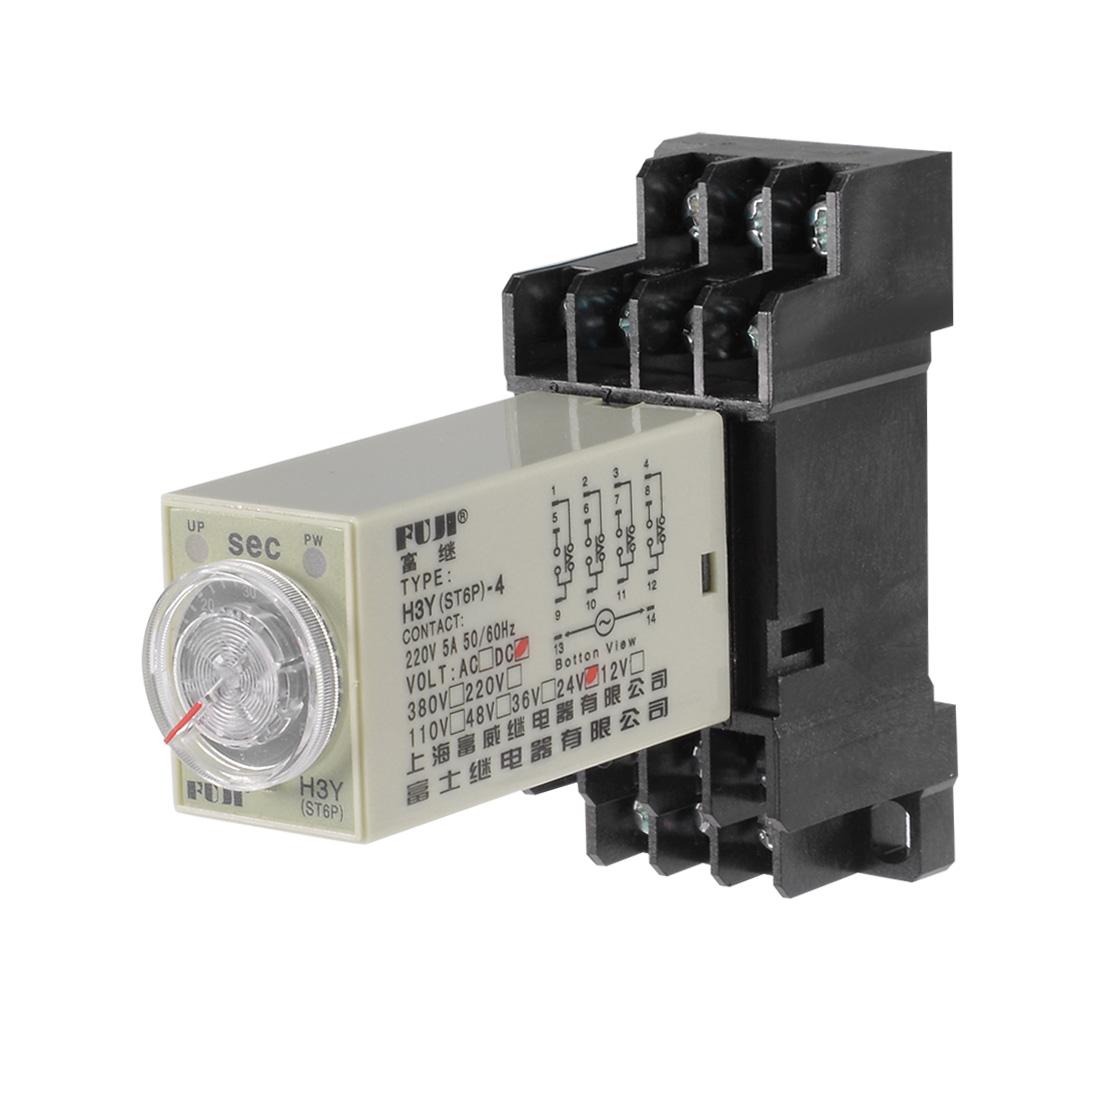 24VDC 60S 14 Terminals Range Adjustable Delay Timer Time Relay H3Y-4 w base